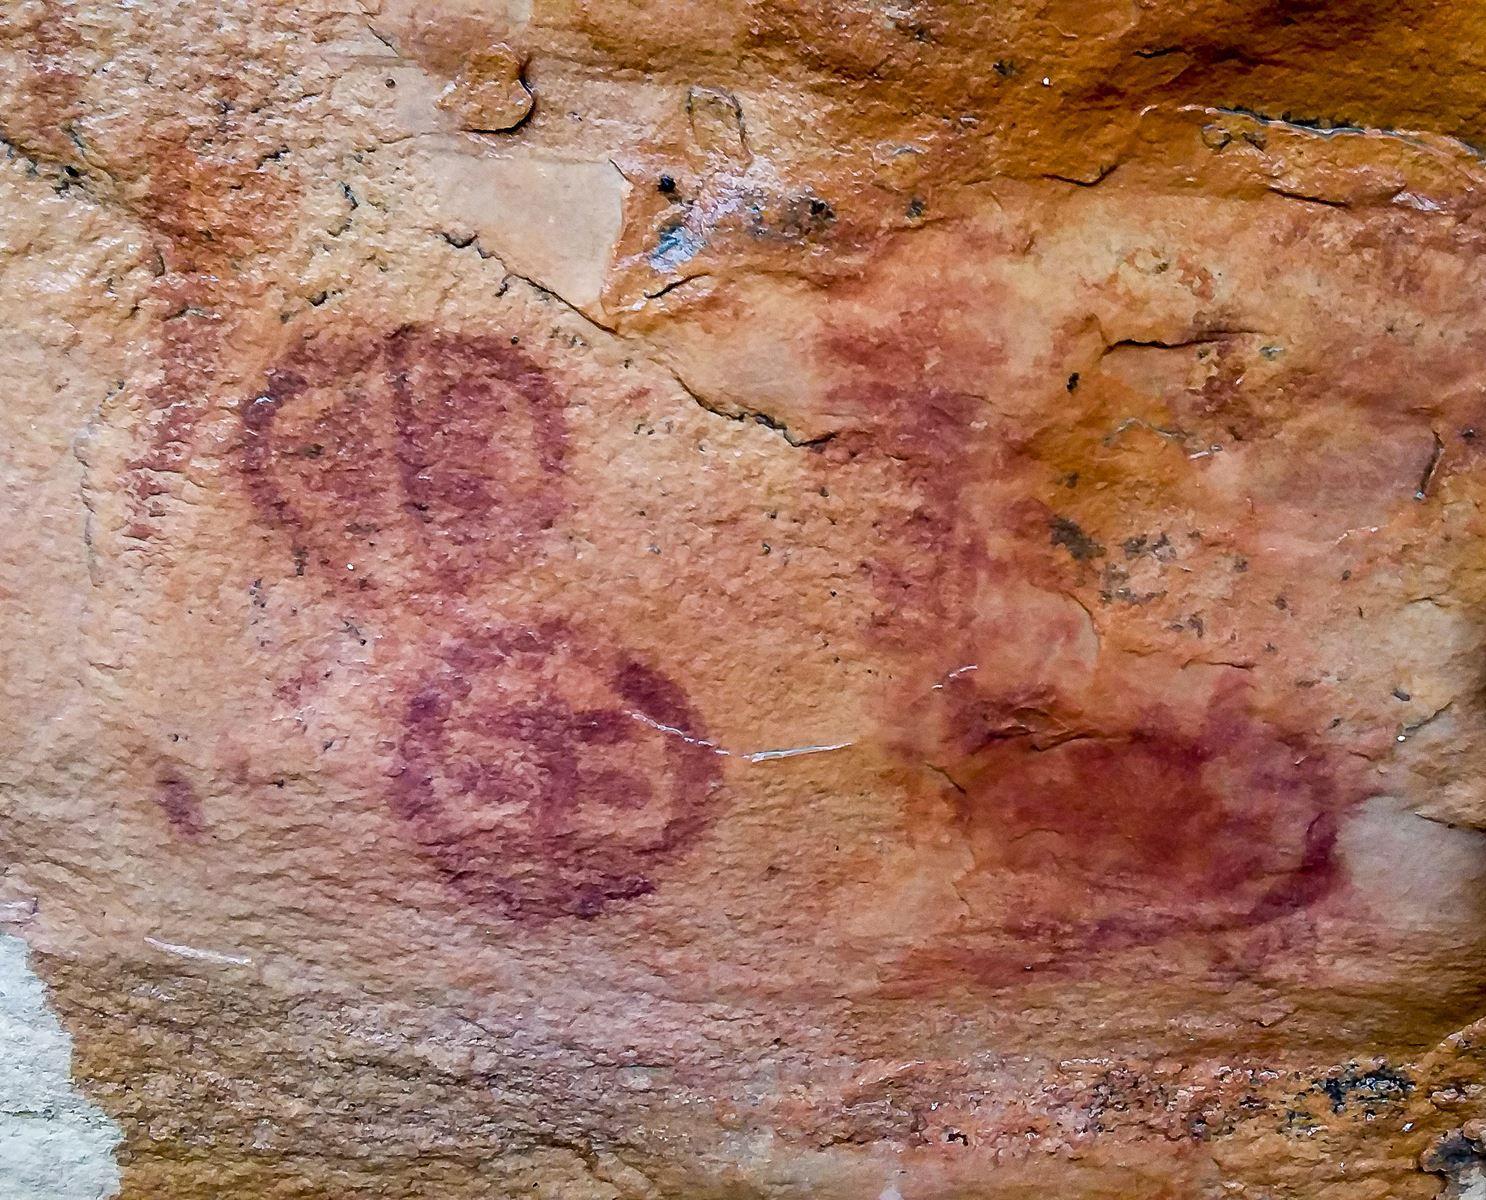 On remarquera le signe 'Kanaga' dans un cercle.